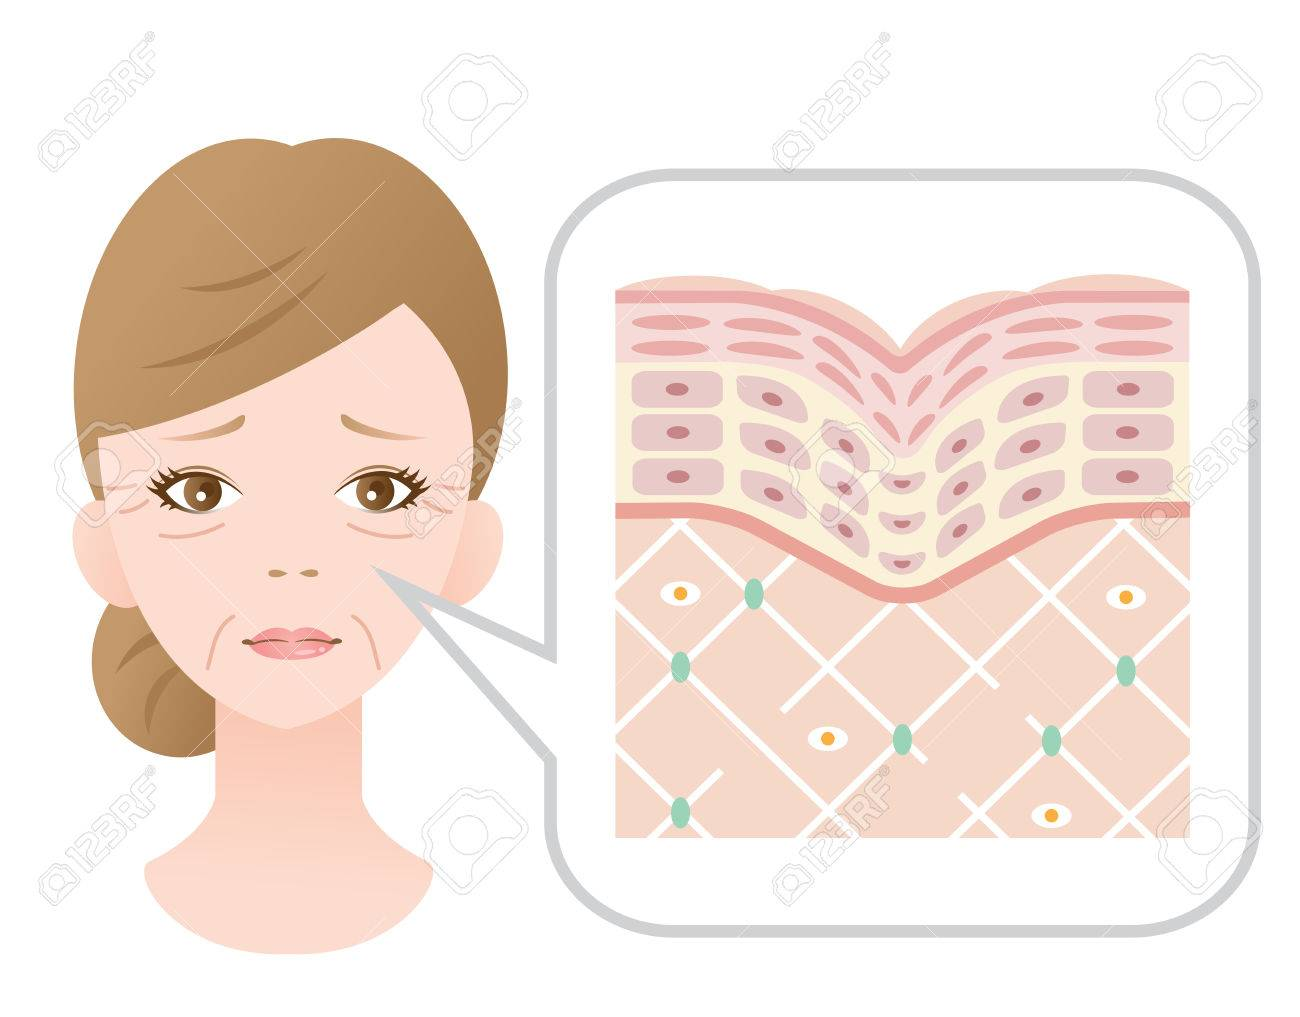 Diagram of old skin showing the collagen framework is broken and wrinkles appears. - 75454332